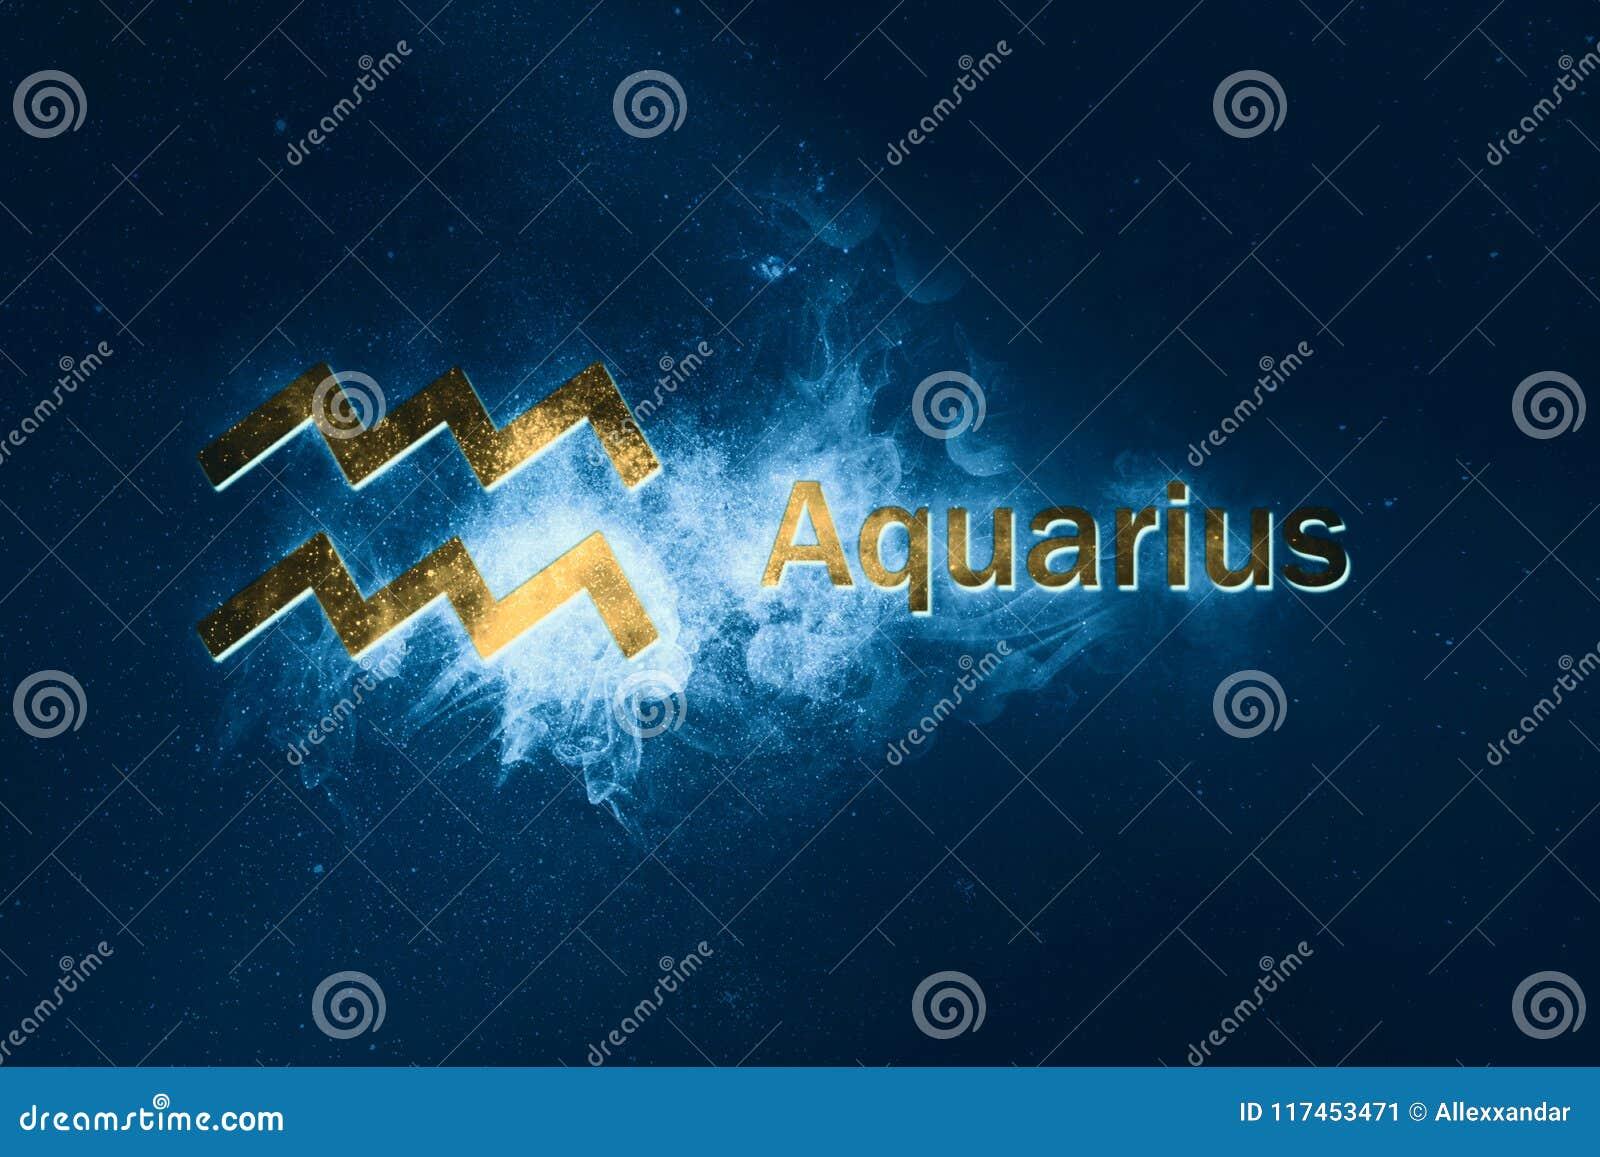 Aquarius Horoscope Sign Abstract Night Sky Background Stock